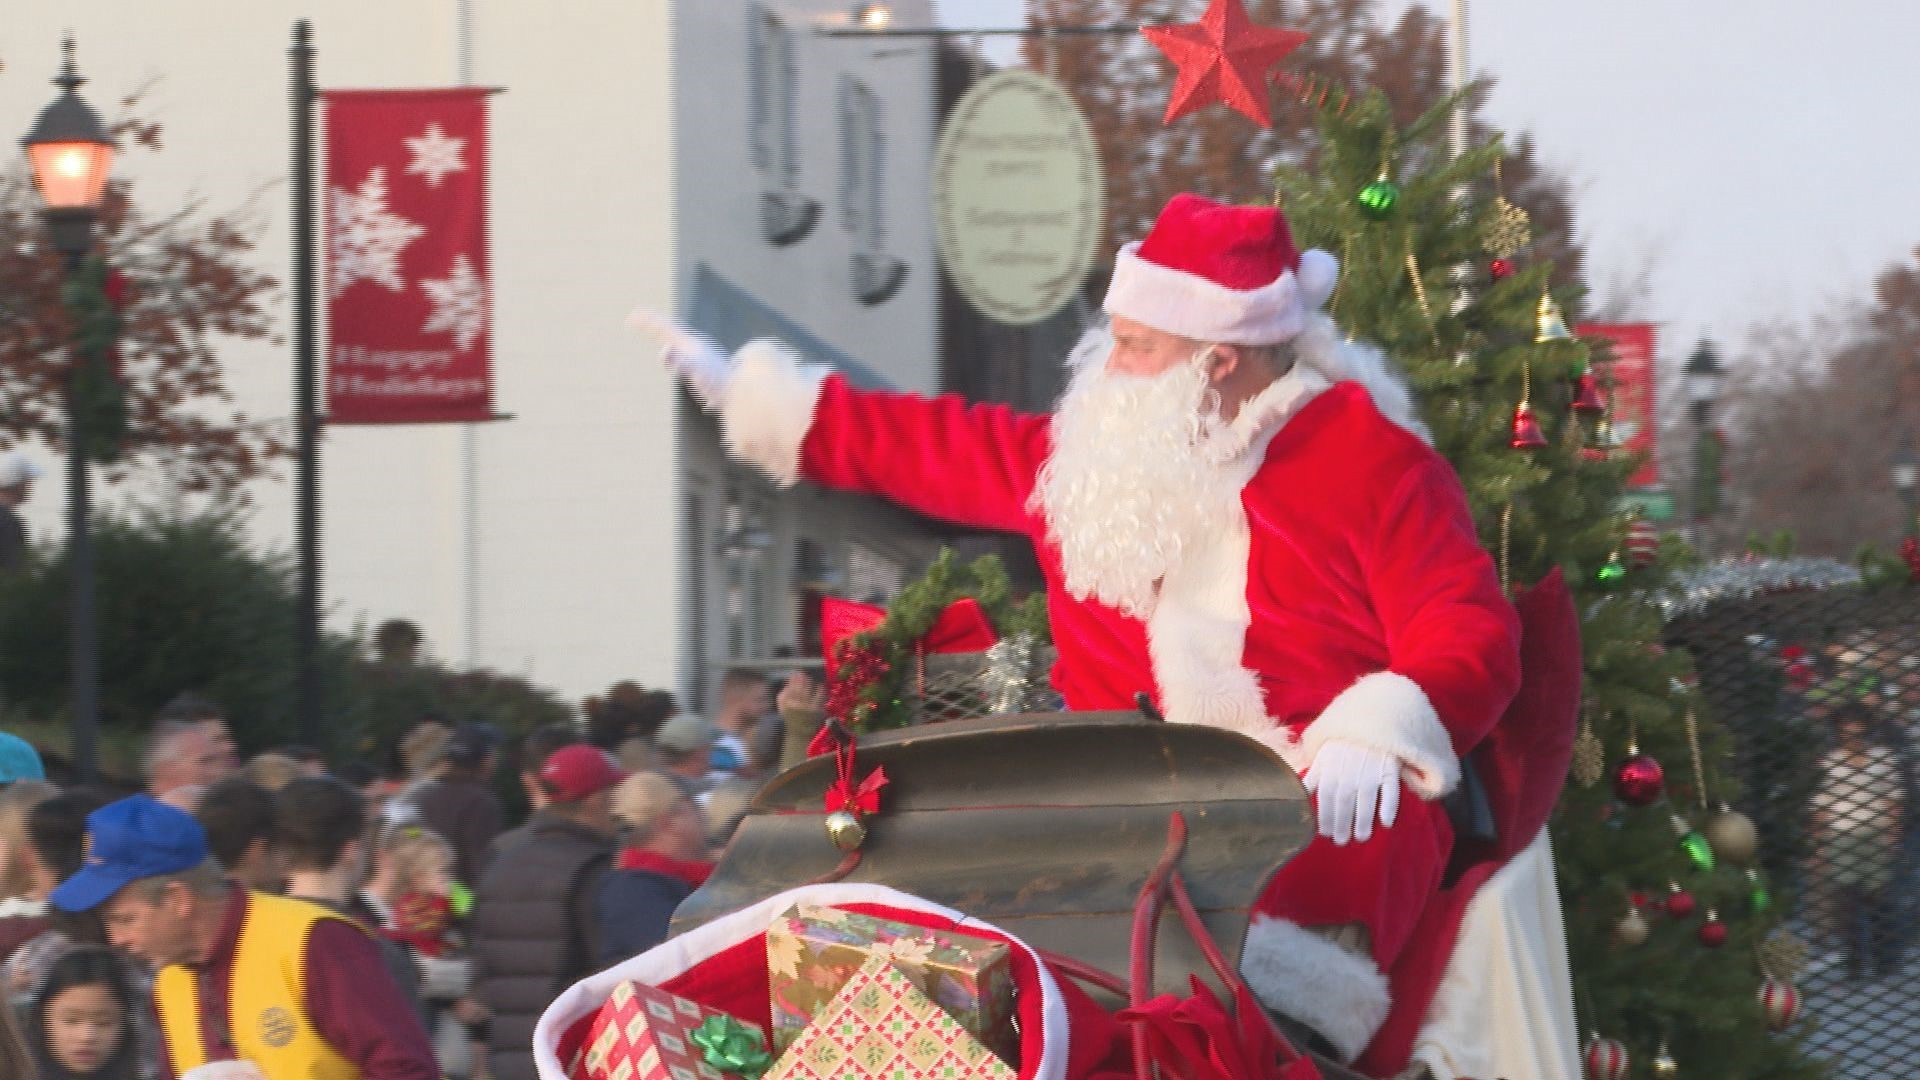 Christmas Traffic 2020 2020 Drive thru Christmas parades in North Carolina | wfmynews2.com